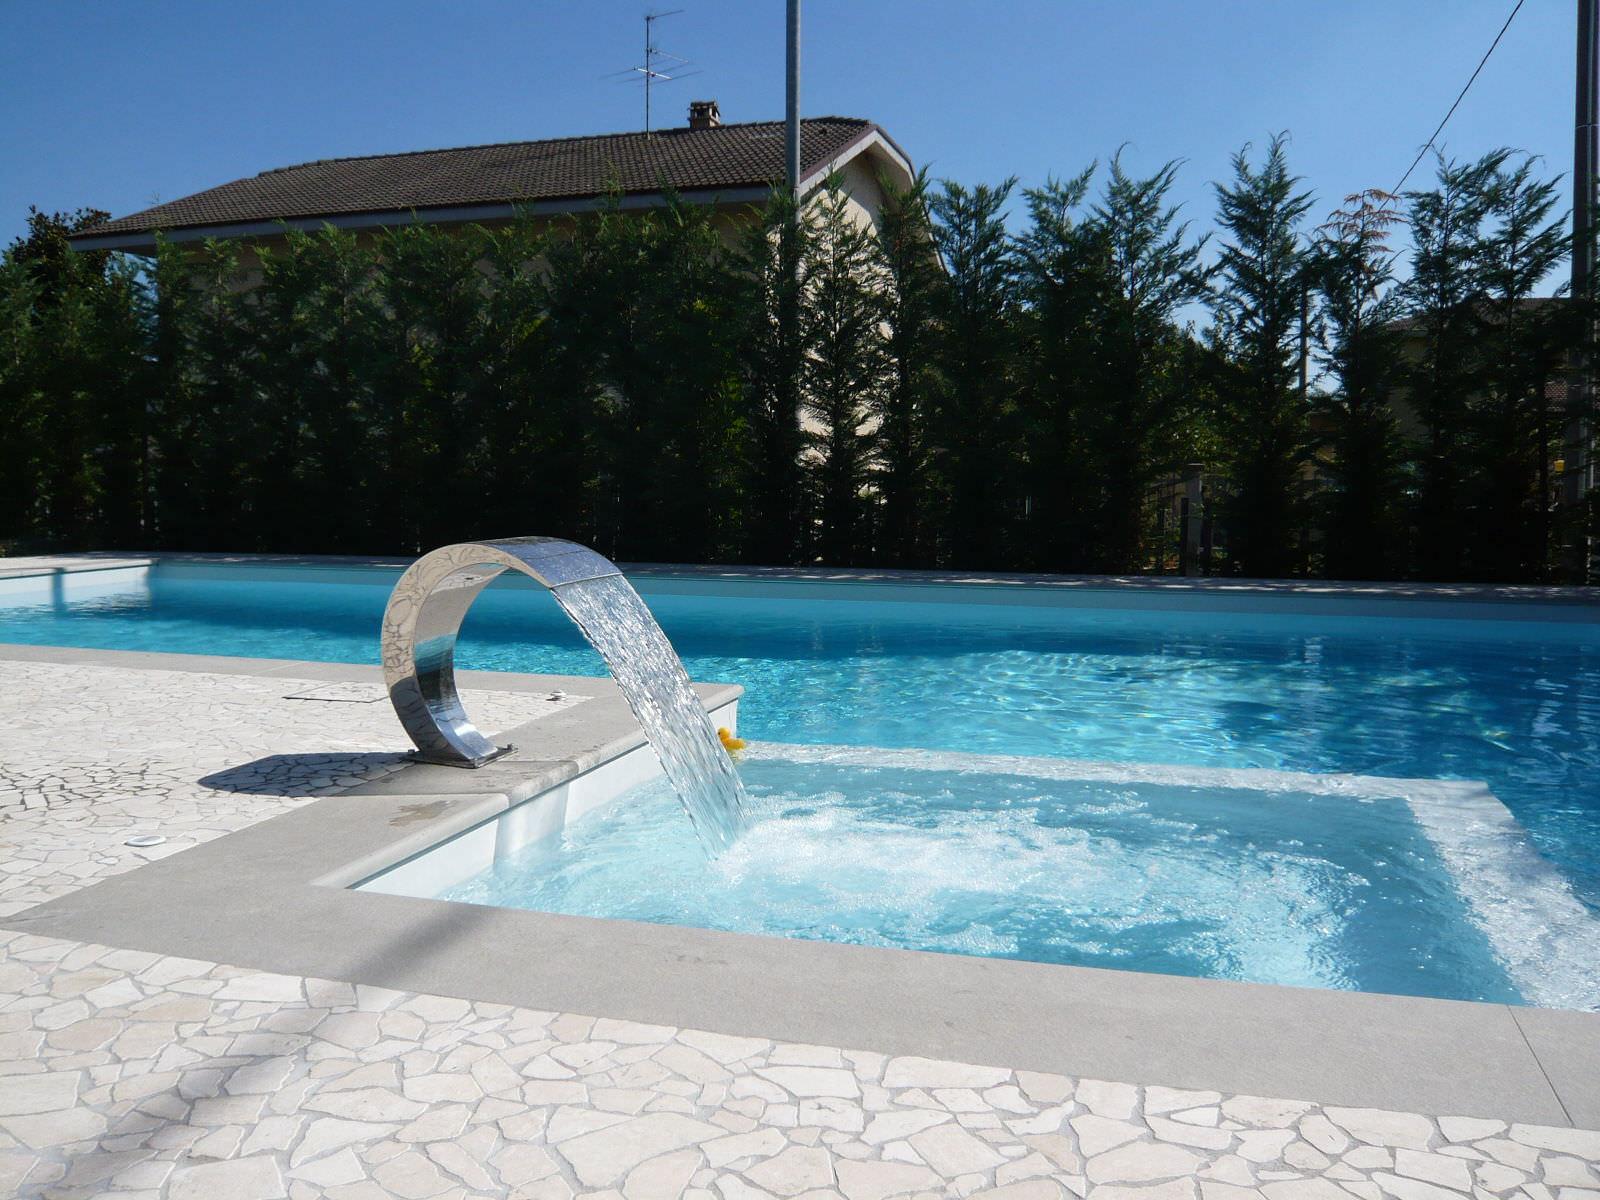 Pool Springbrunnen - EDILFARE PISCINE